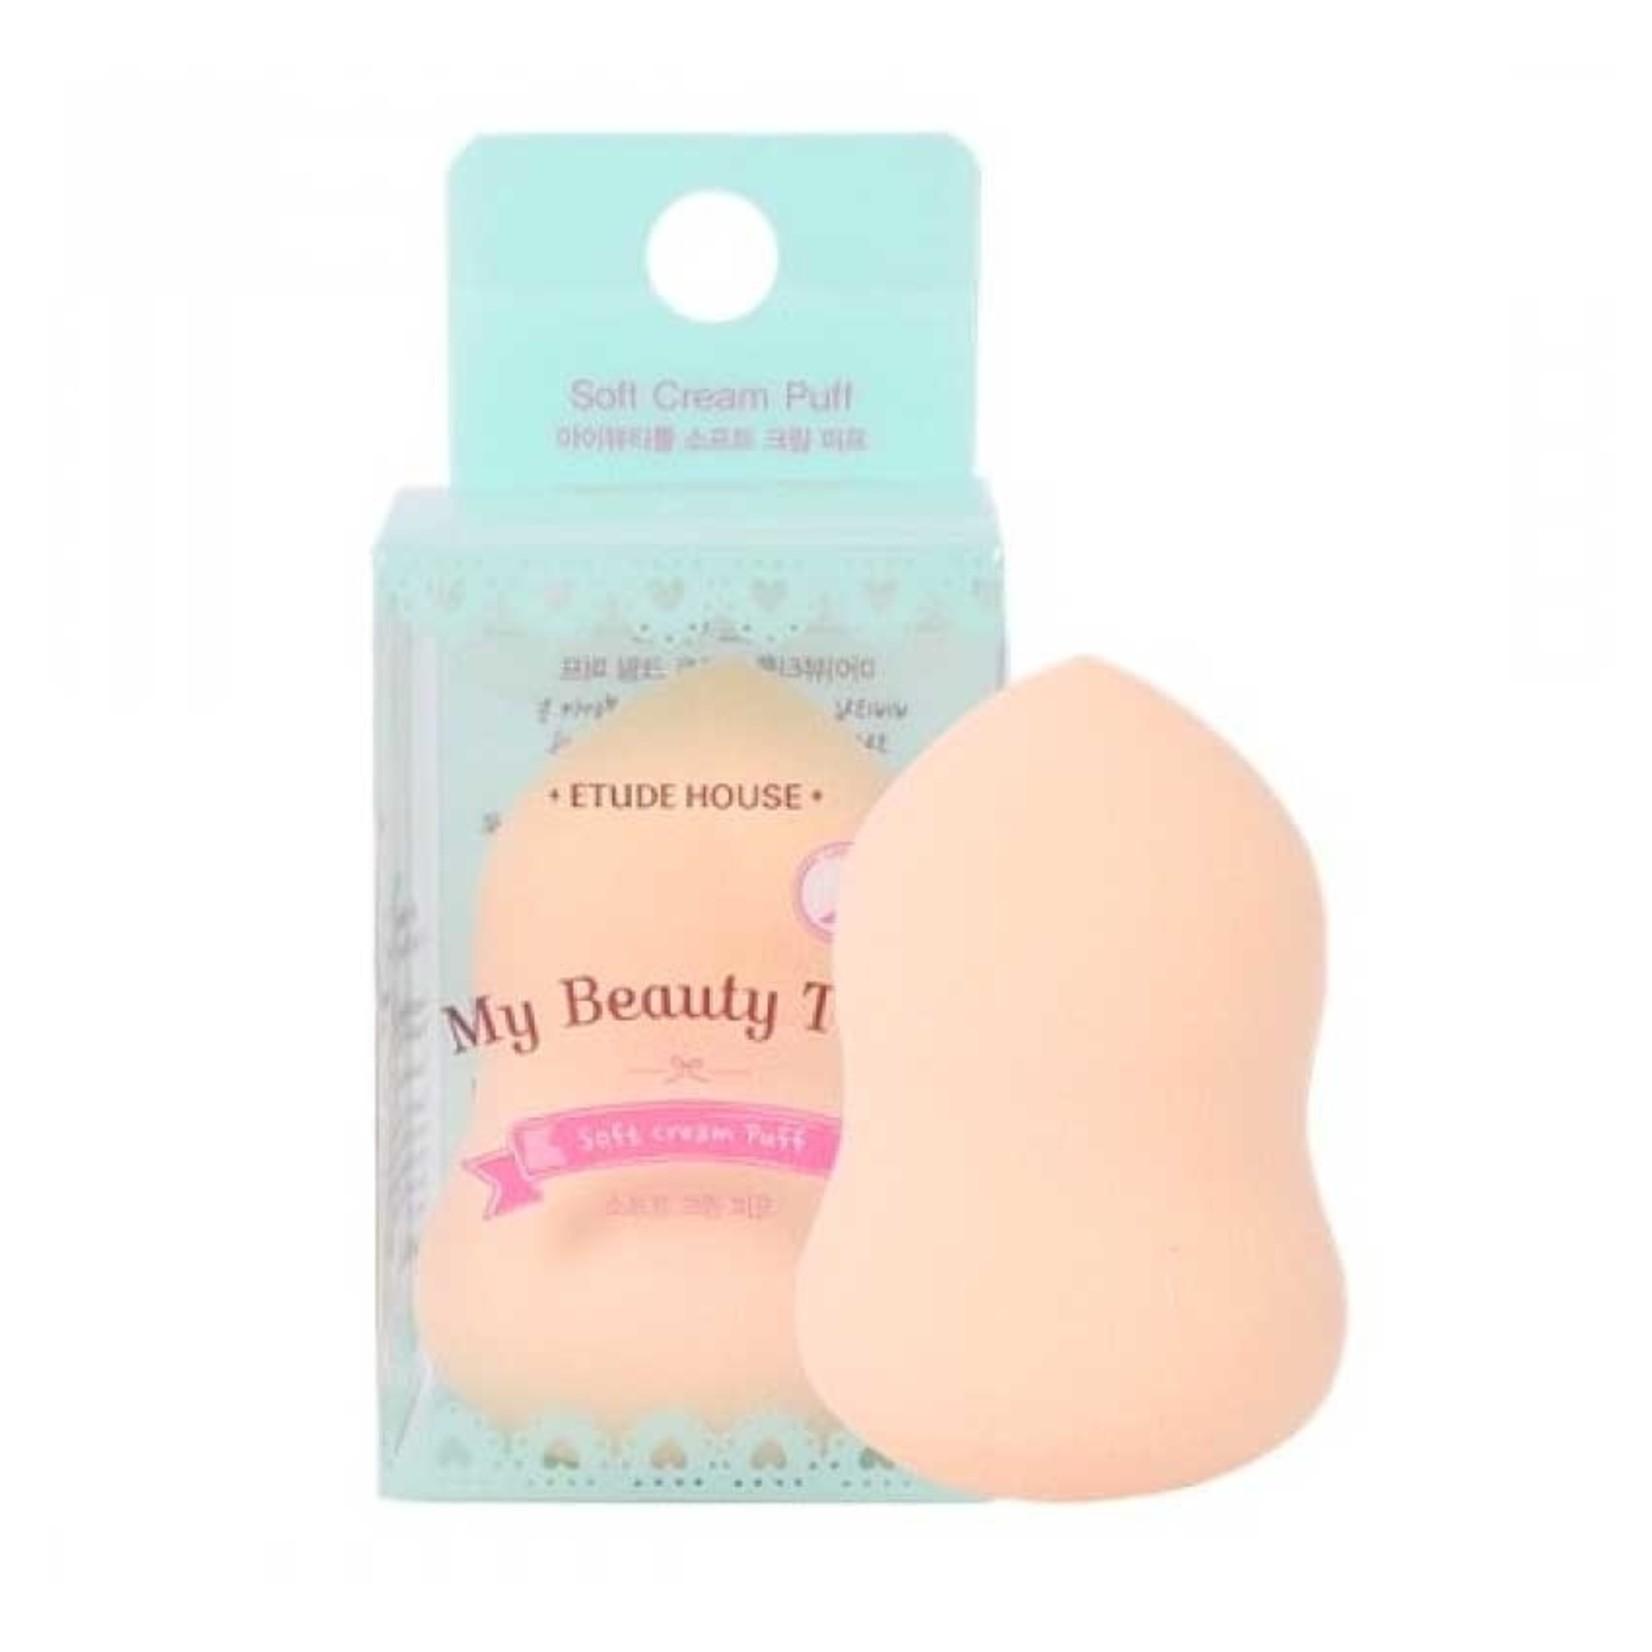 My Beauty Tool Soft Cream Puff